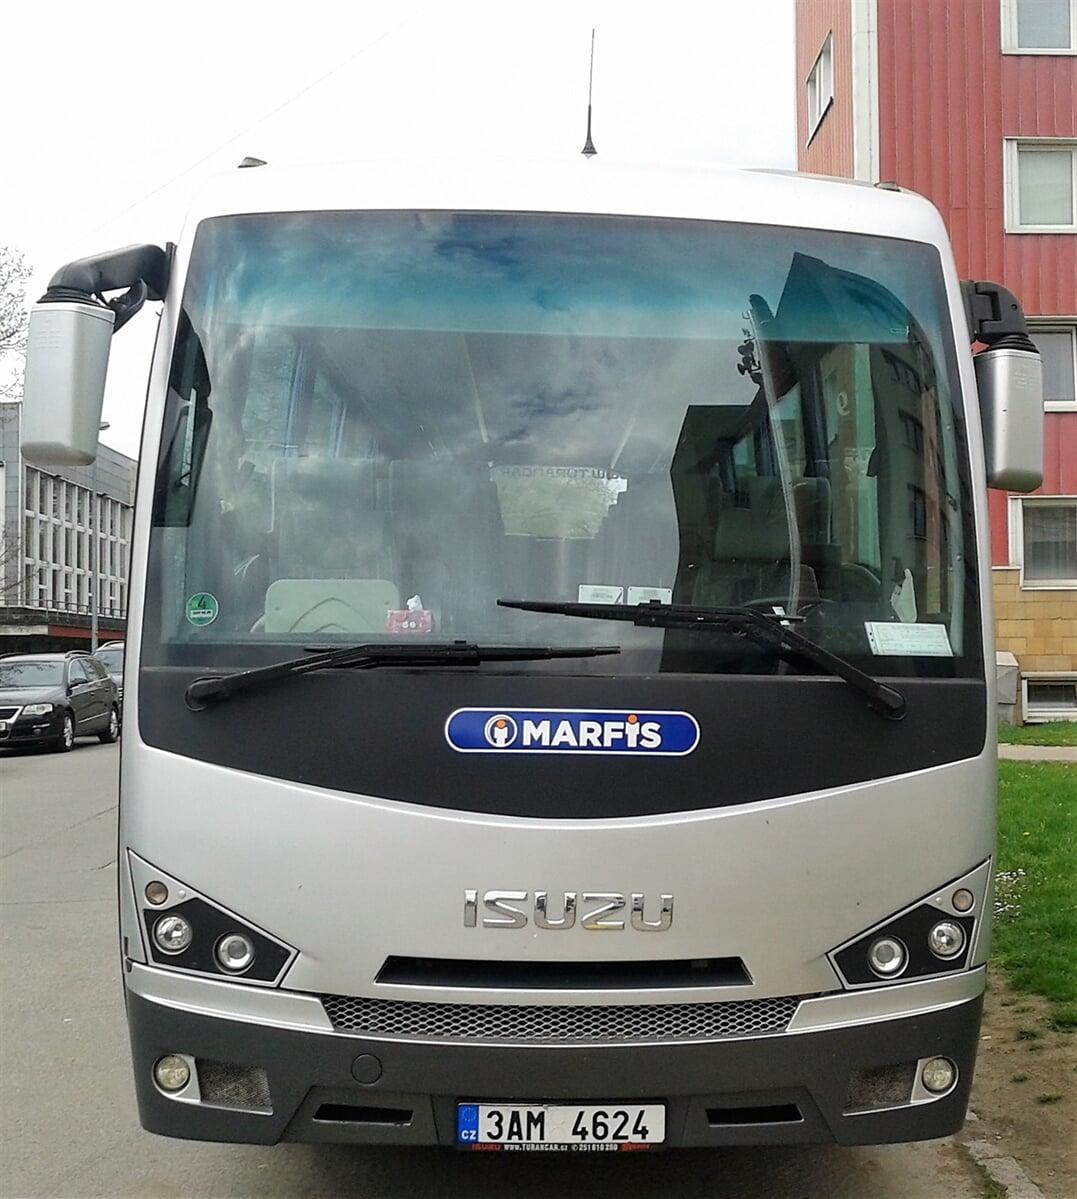 Isuzu - pronájmy mikrobusů a autobusů MARFIS Praha